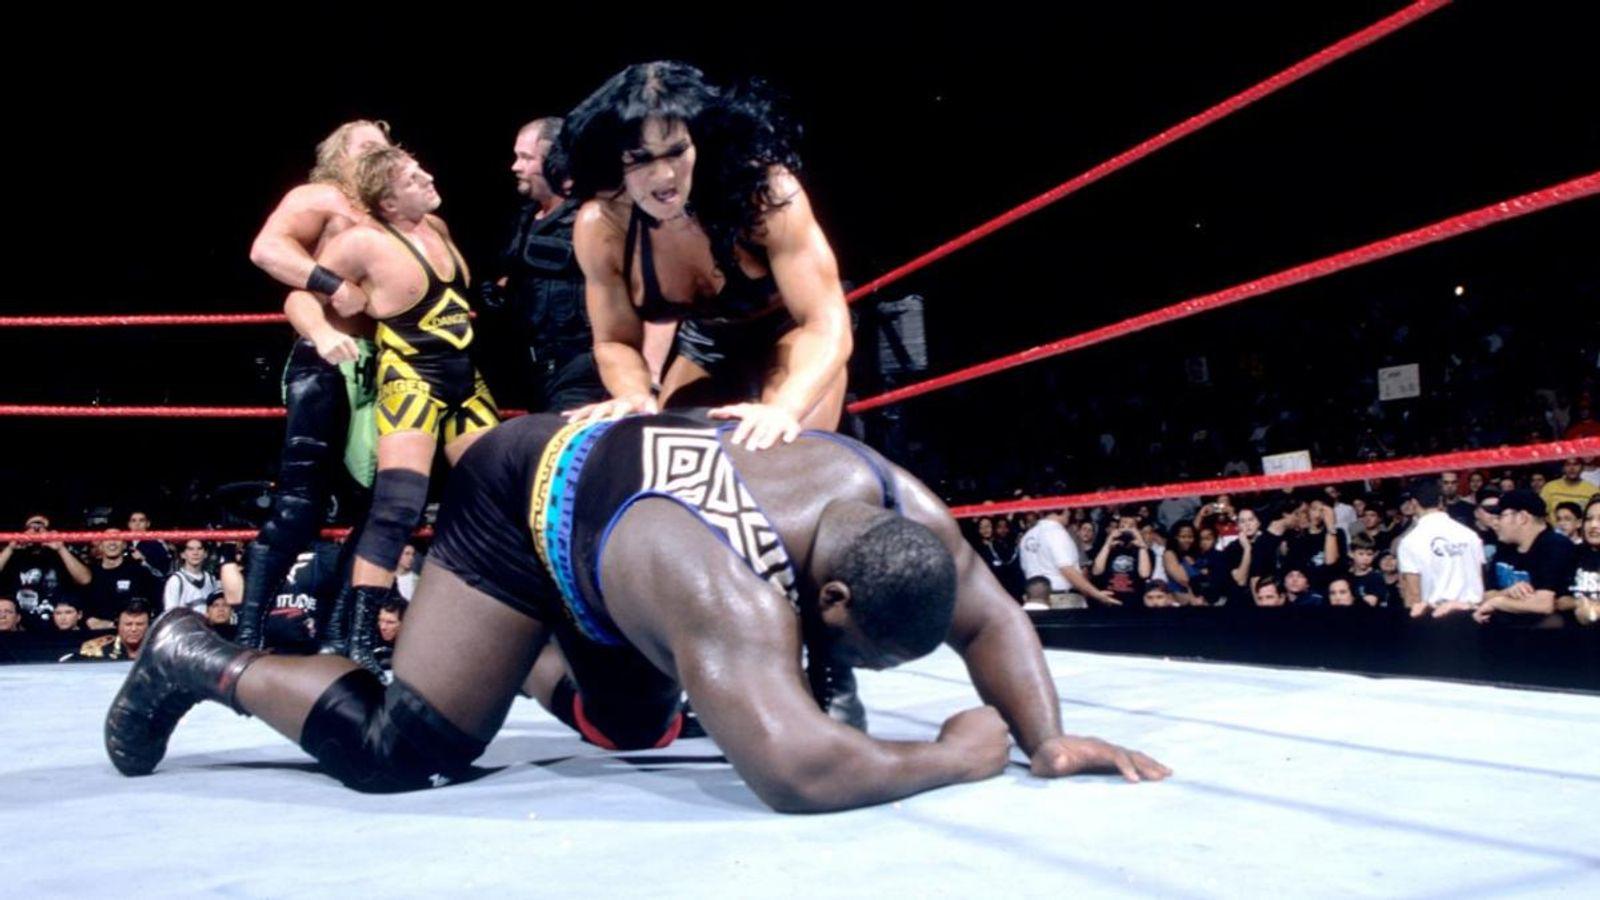 WWE 2K17 Chyna vs Ivory Womens Championship Wrestlemania